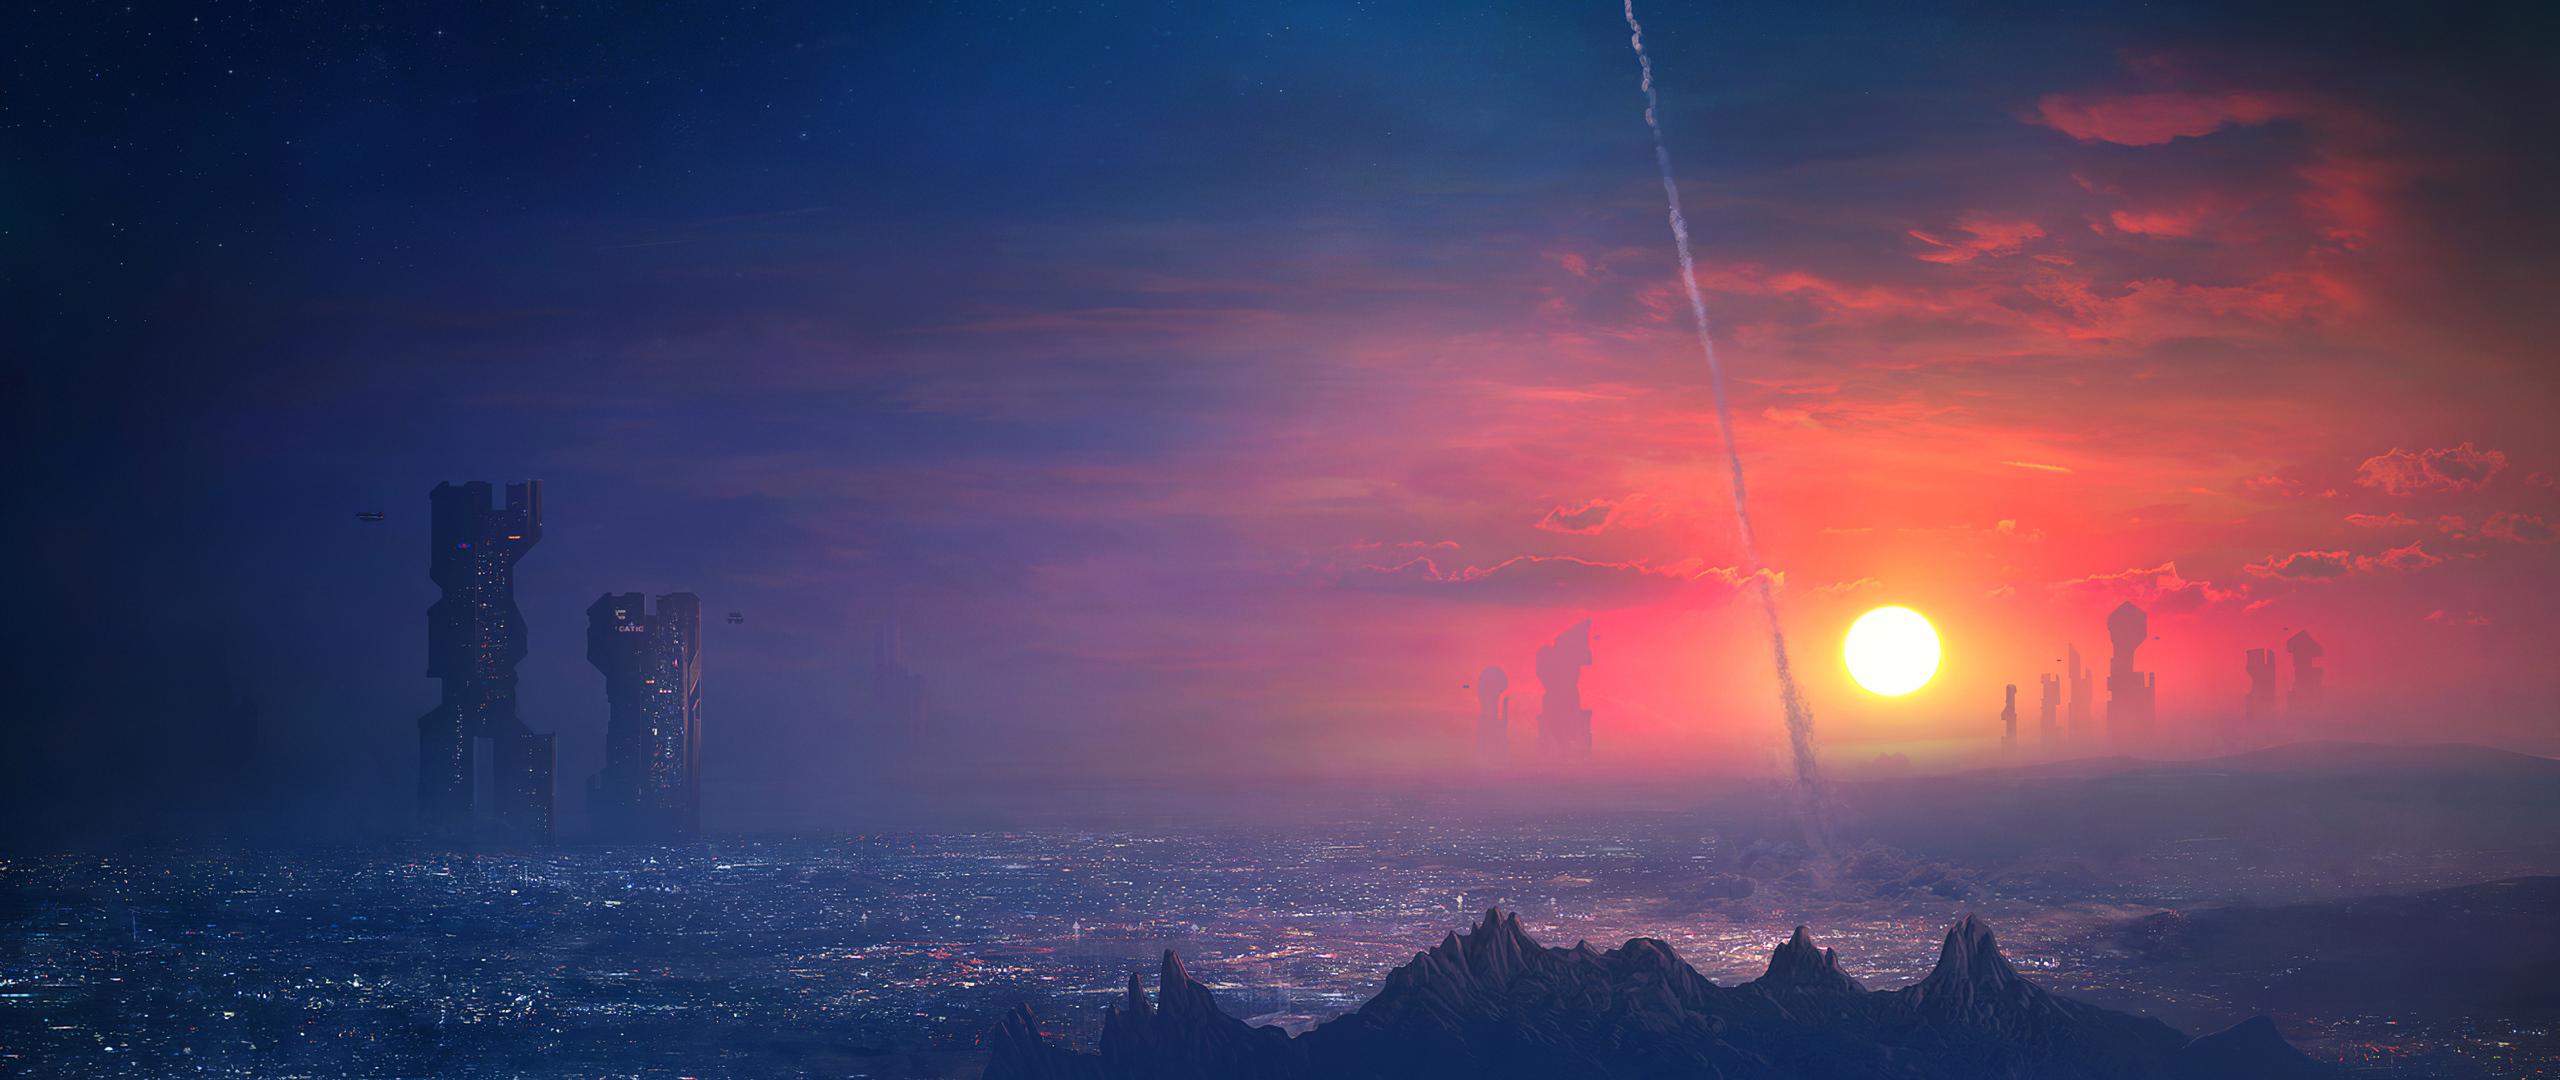 smoke-and-neon-city-4k-sf.jpg